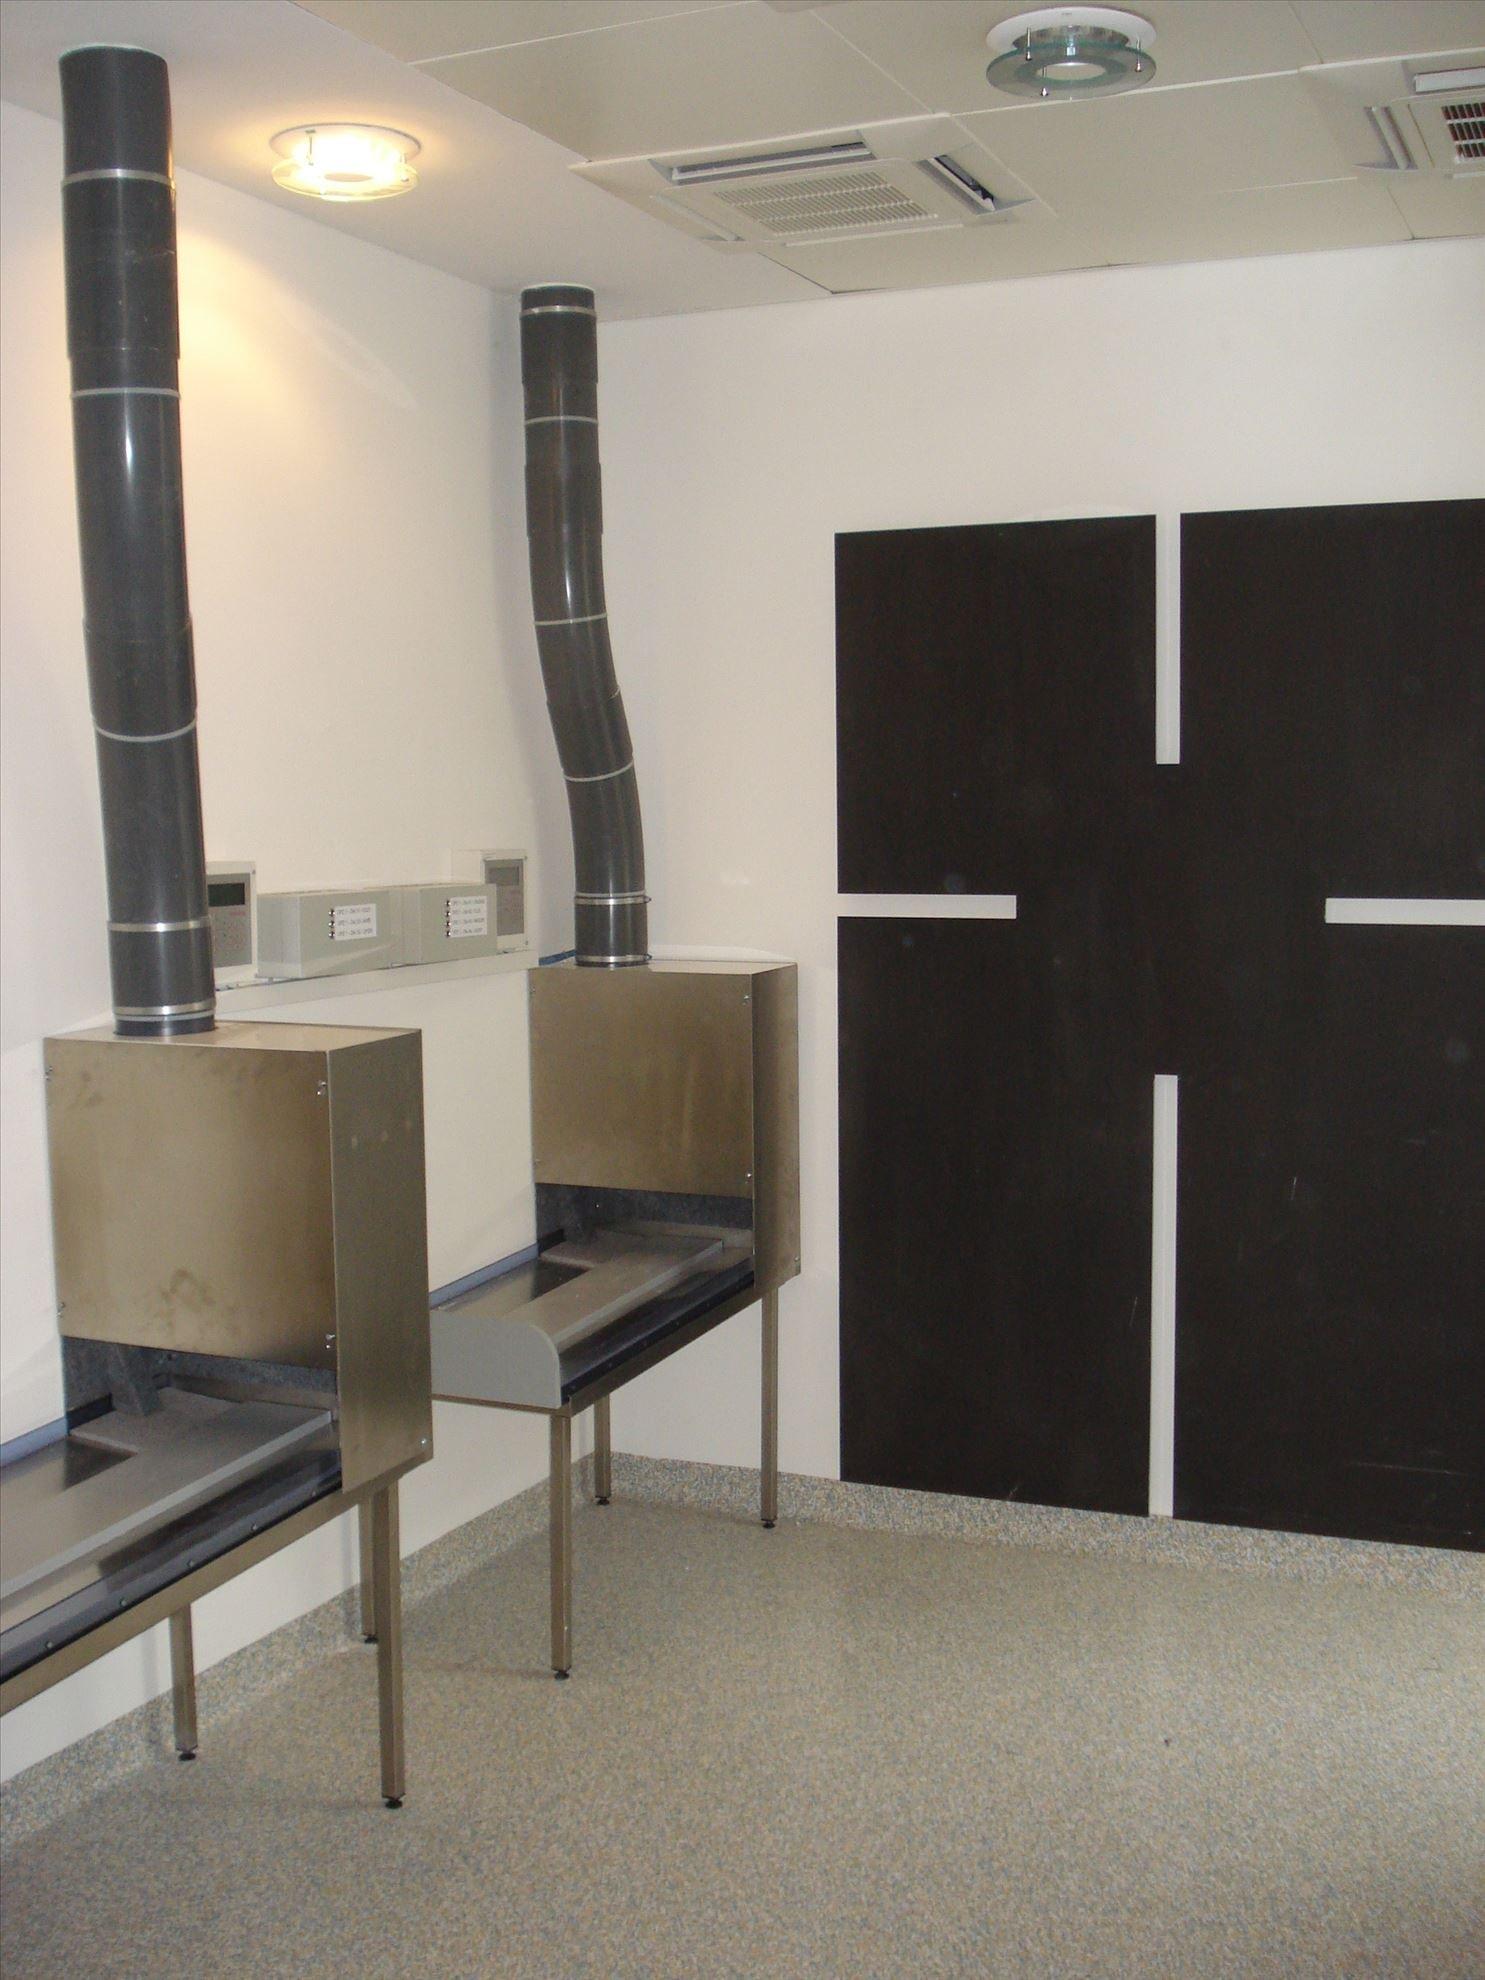 Superordinate infrastructure, Stmk. Krankenanstalten